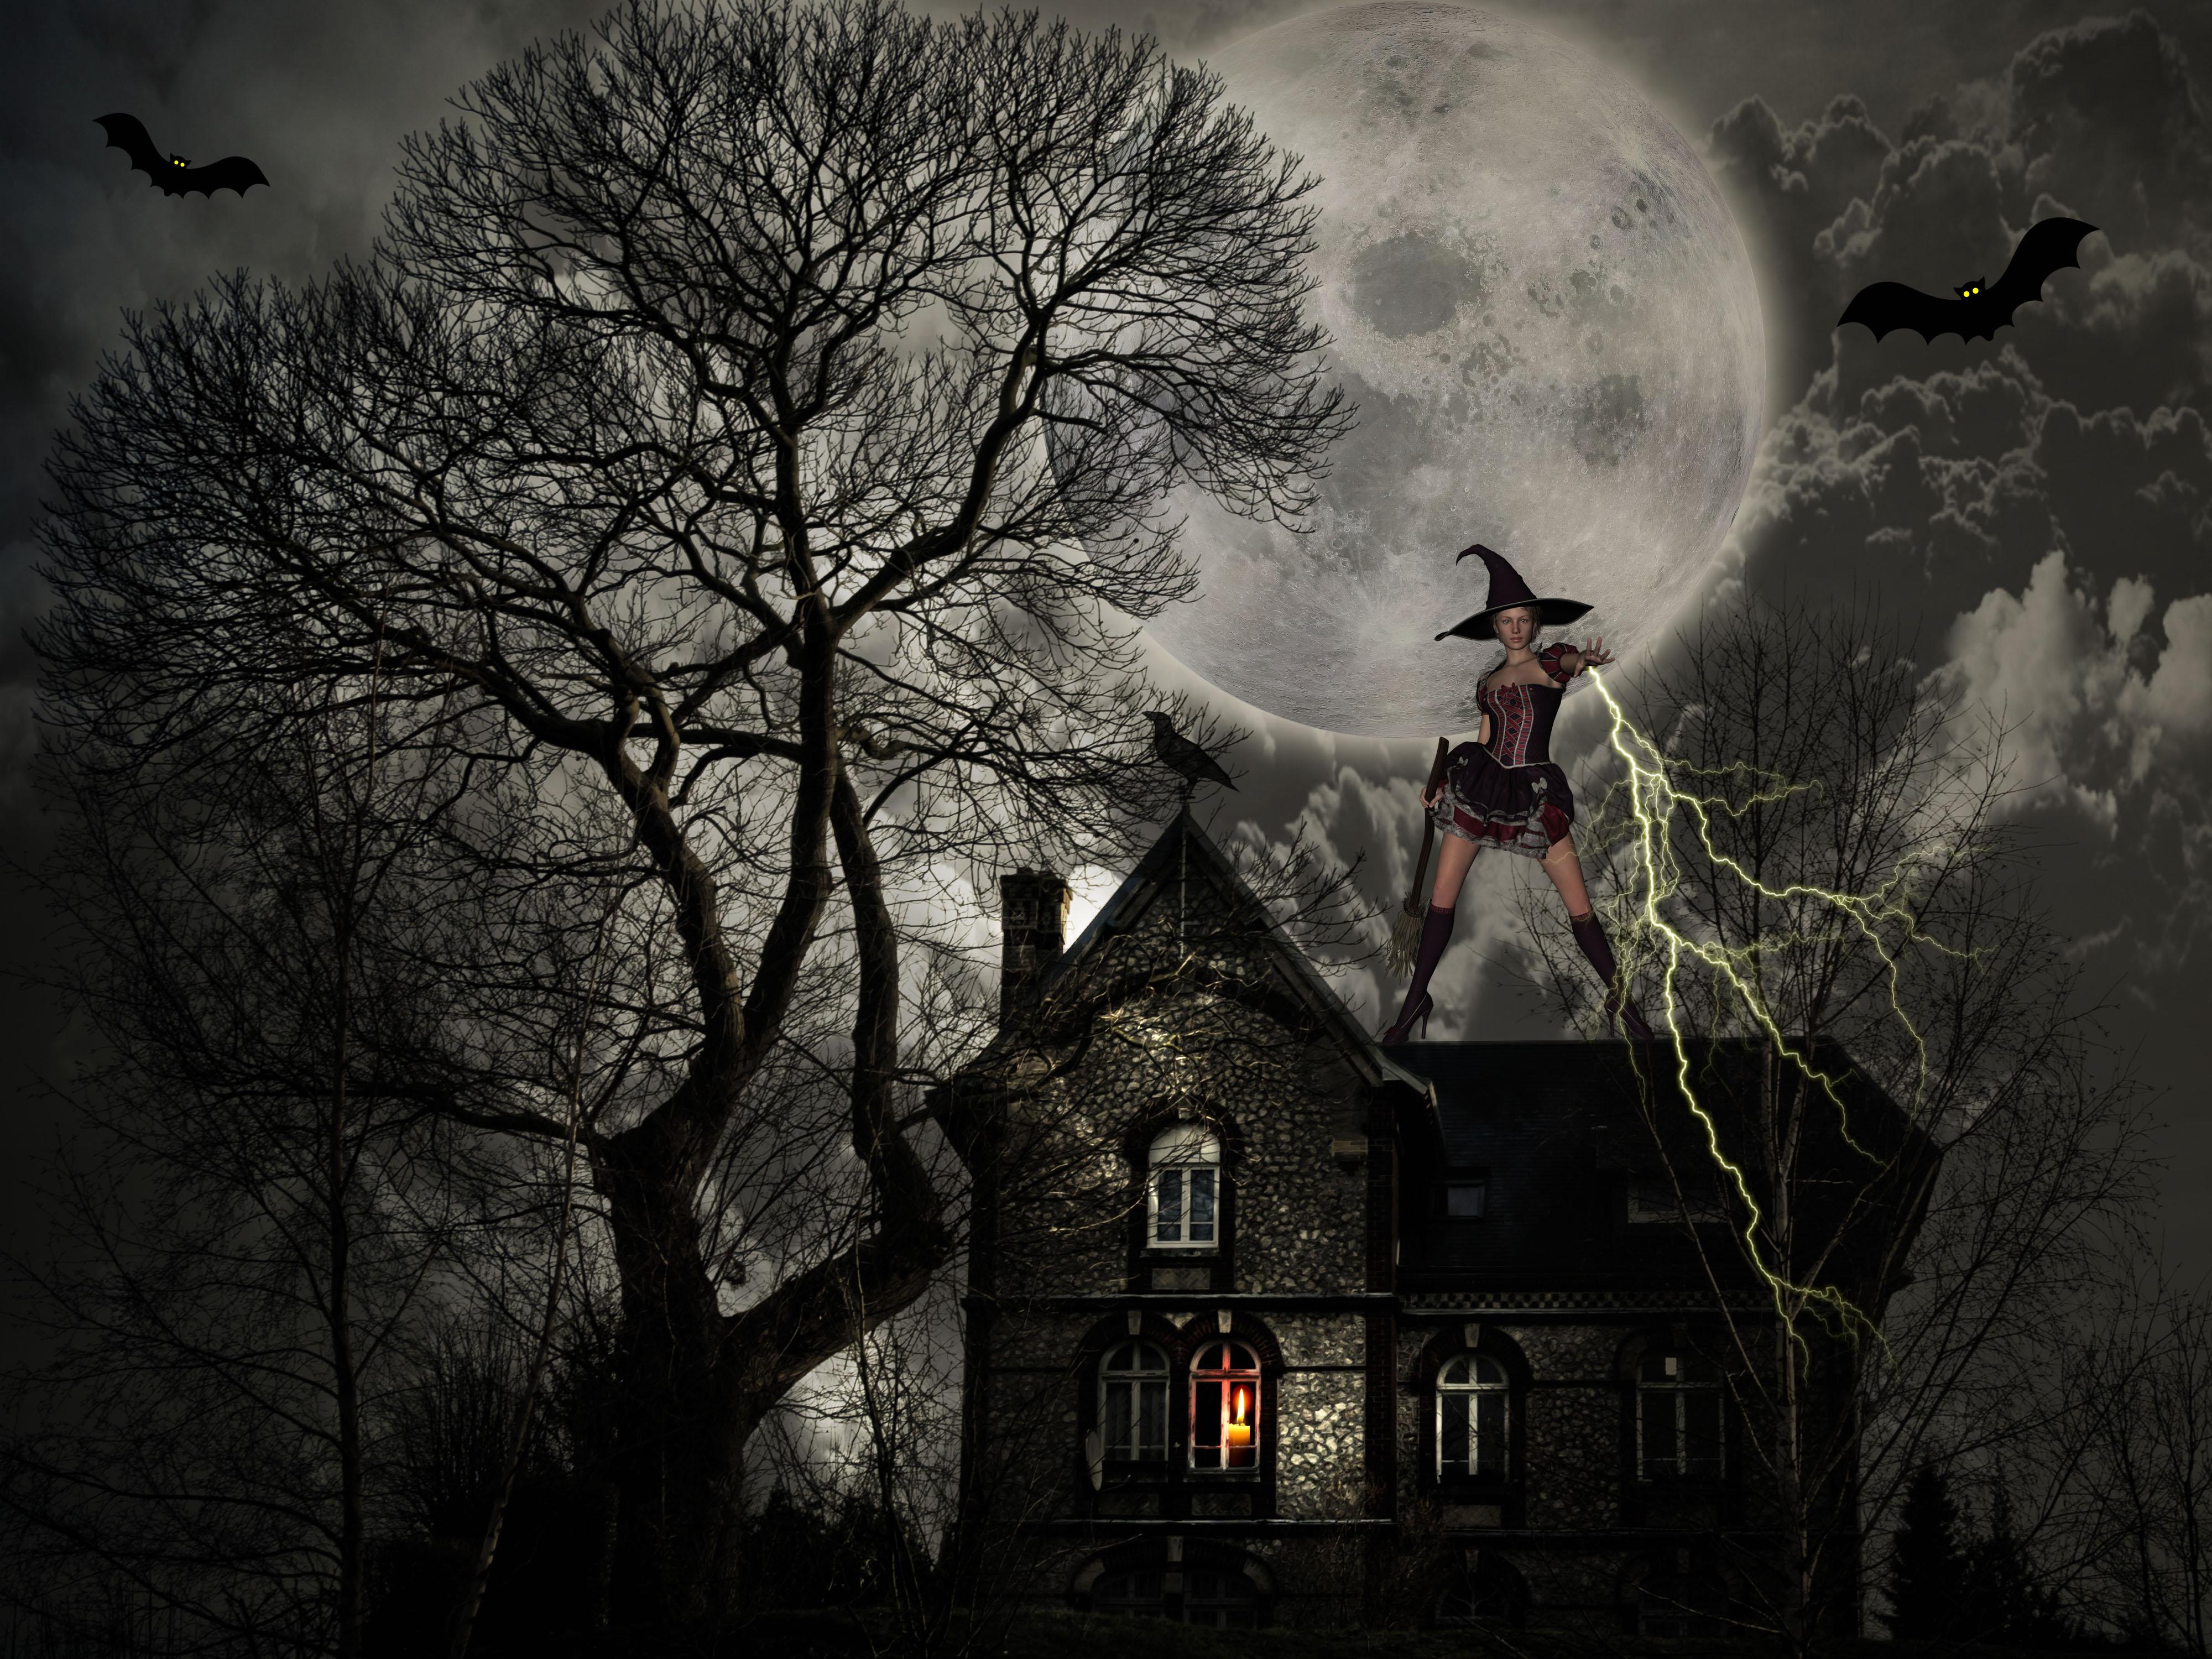 Gambar Tua Fantasi Bulan Takut Kengerian Pohon